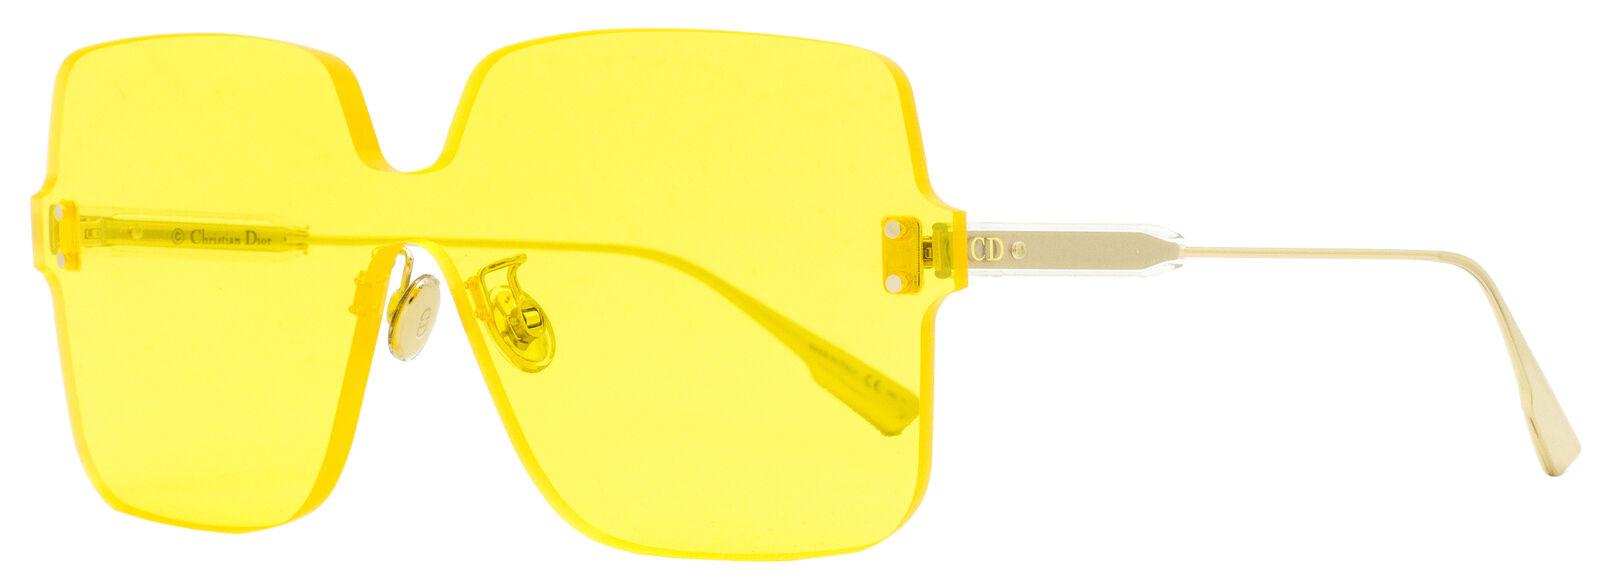 Dior Square Sunglasses ColorQuake 1 40GHO Gold 99mm